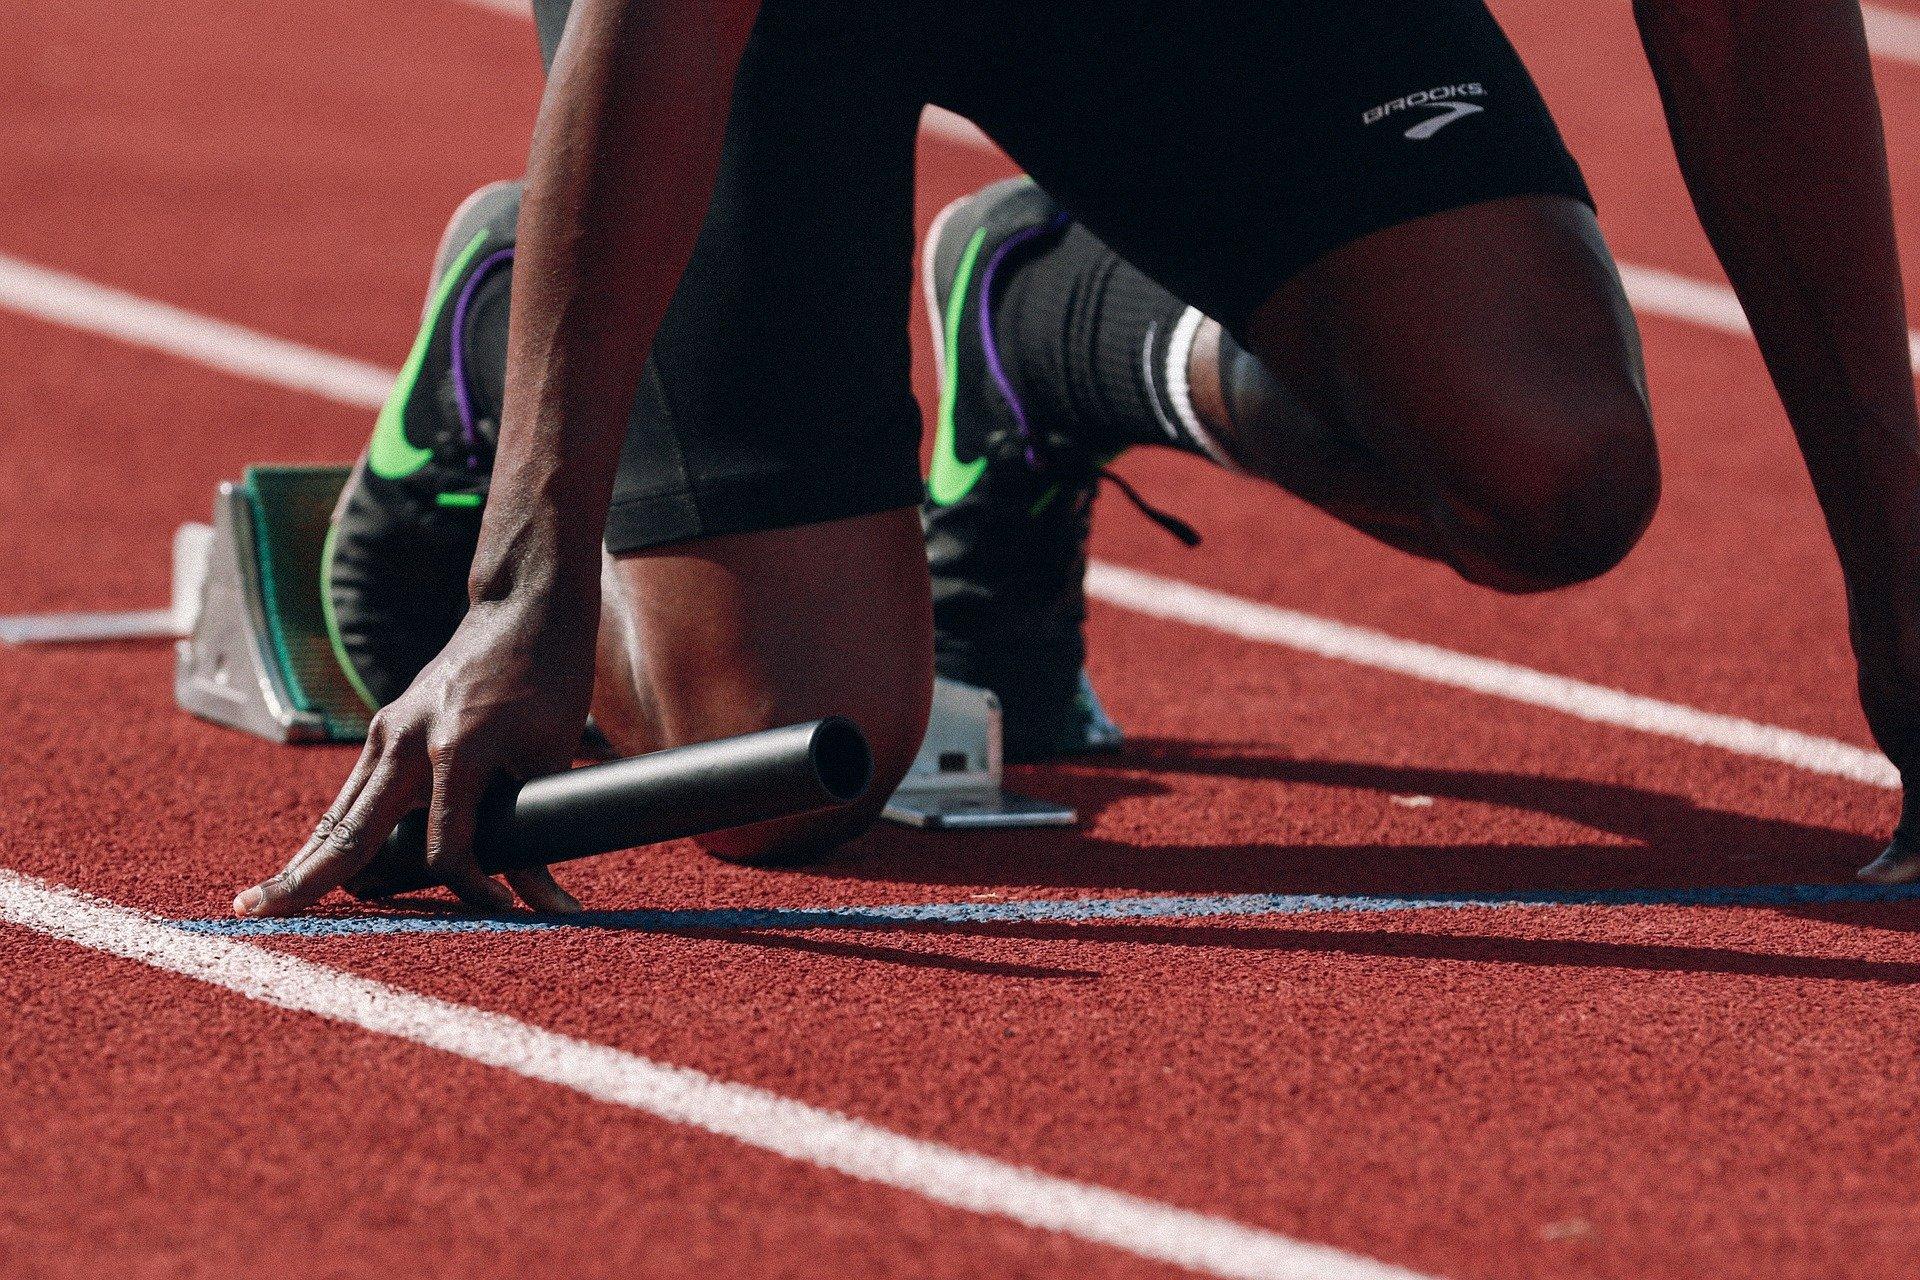 man crouching at start of running track